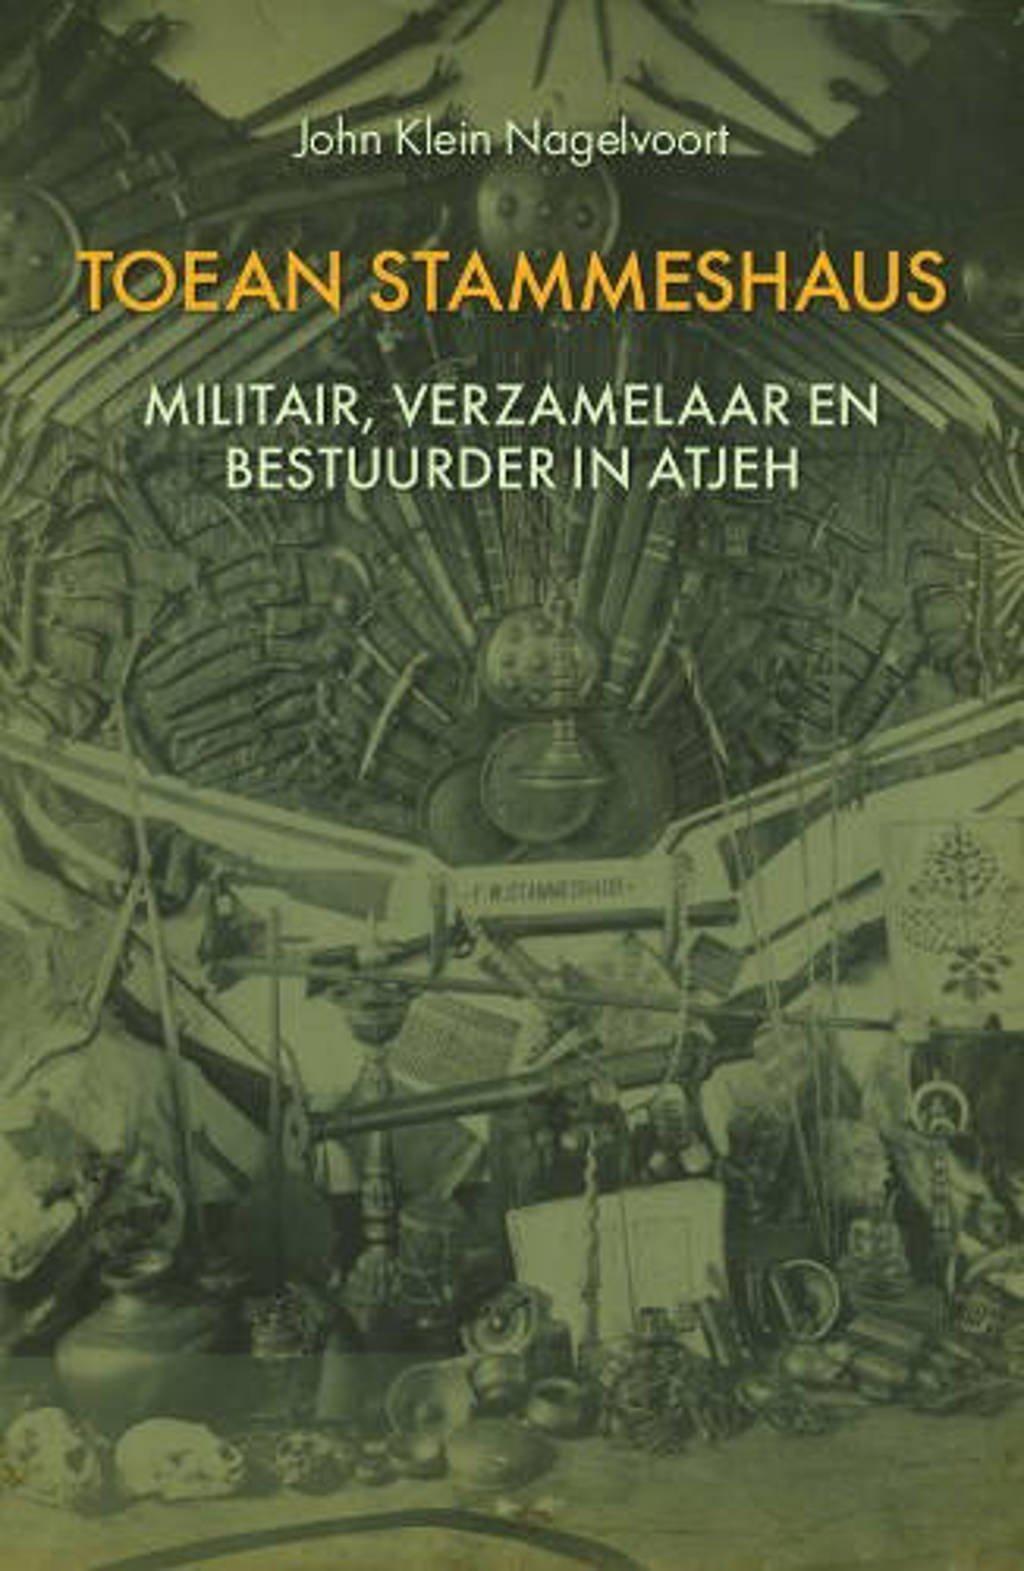 Toean Stammeshaus - John Klein Nagelvoort